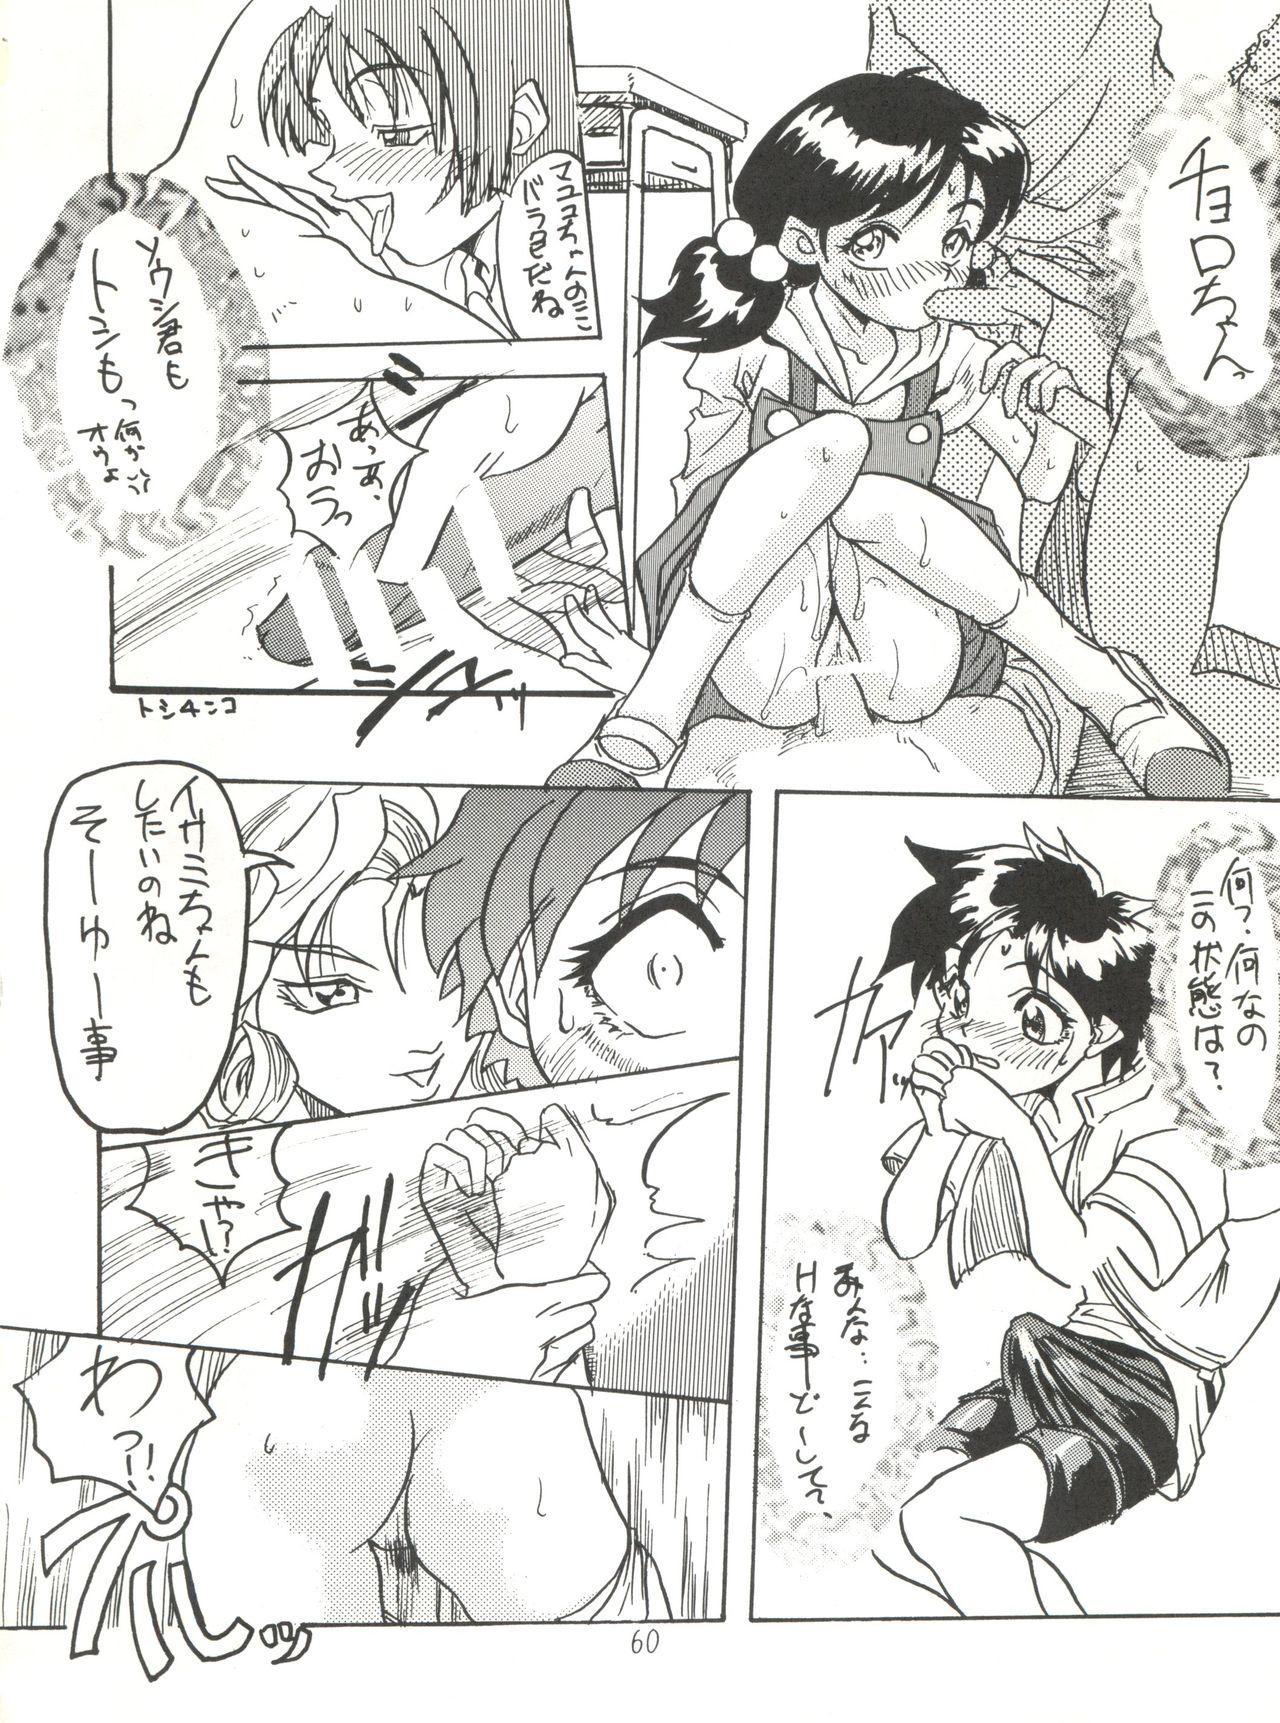 Heart o Migakukkya Nai 59